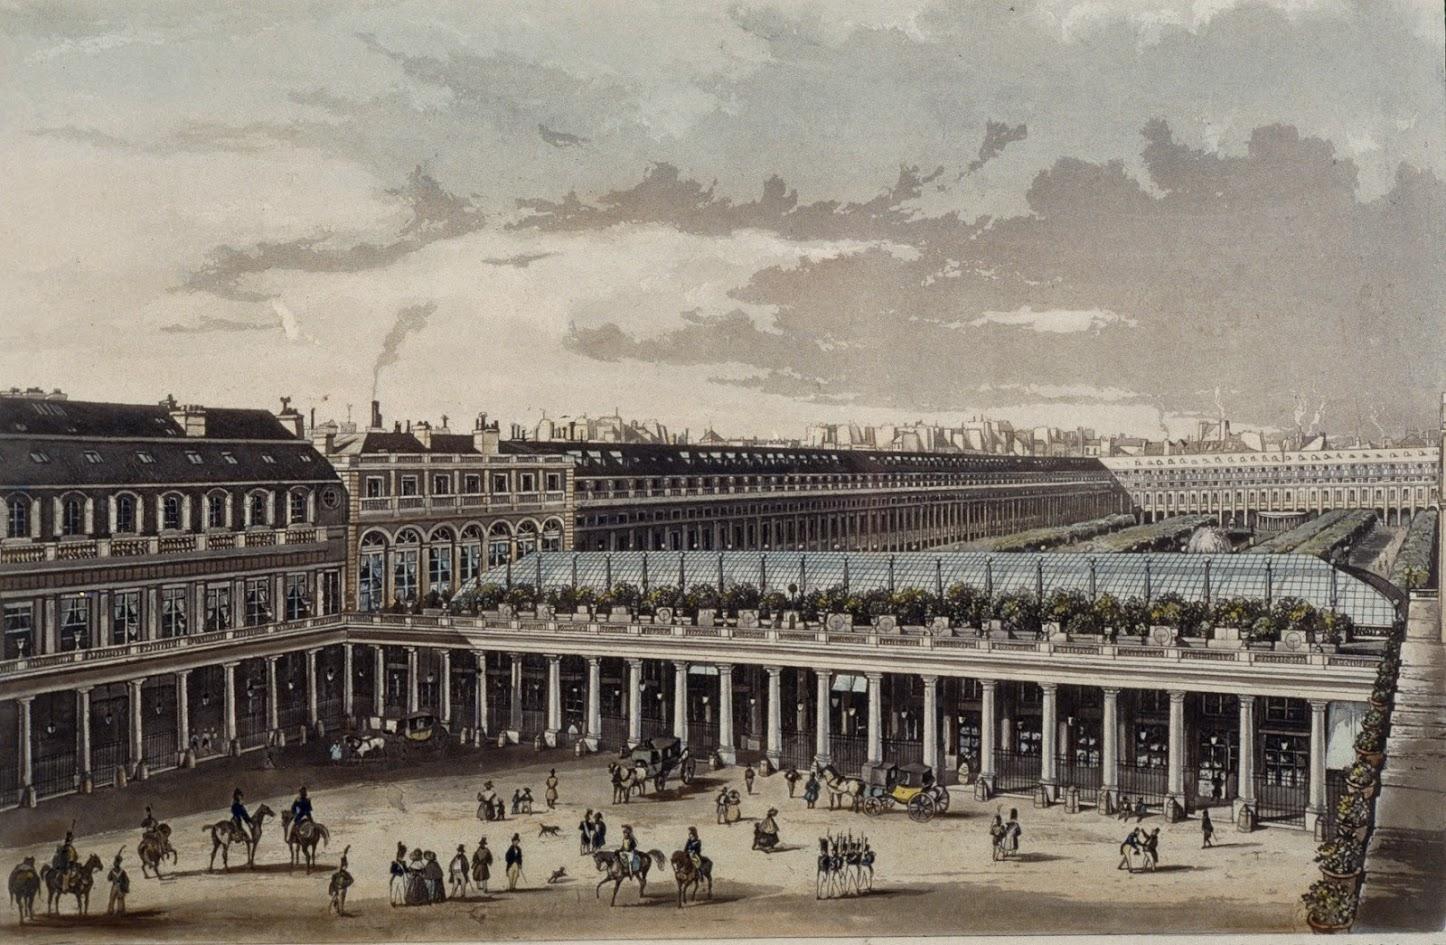 ALLAN KARDEC EM PARIS » Palais Royal